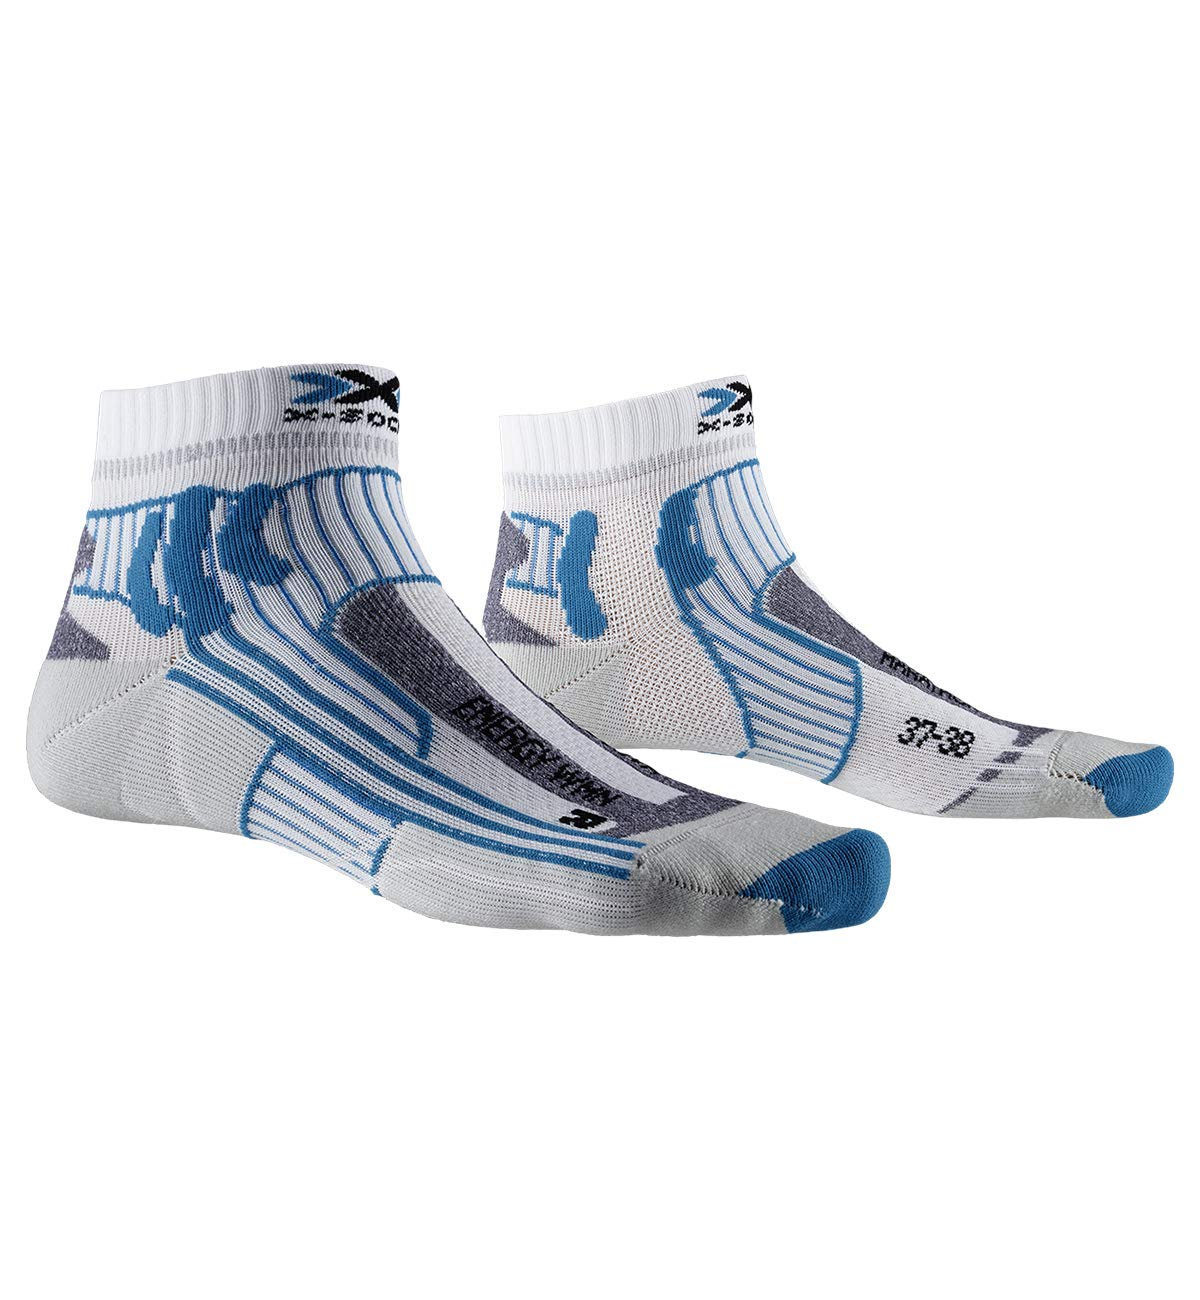 X-Socks Damen Socks Marathon Energy Women, White Print, 35-36, XS-RS10S19W-W015-